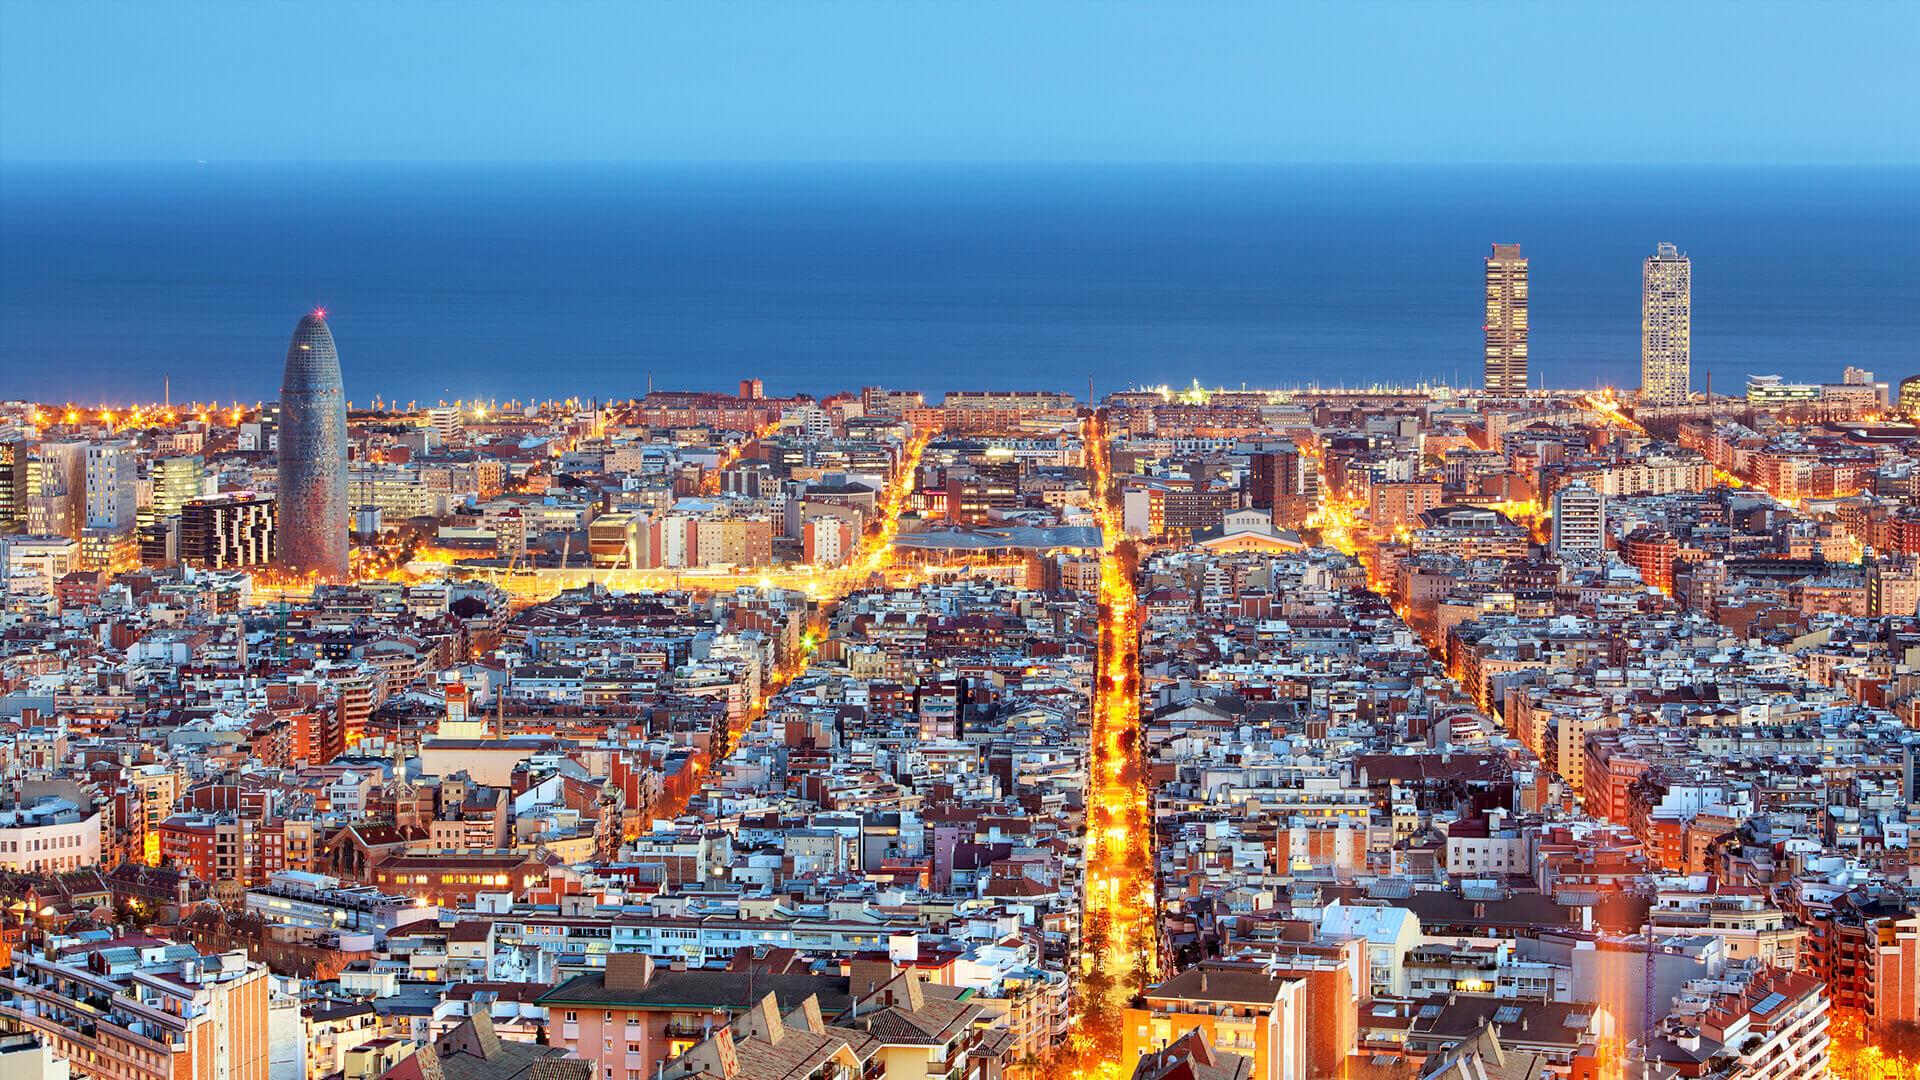 barcelone - Photo